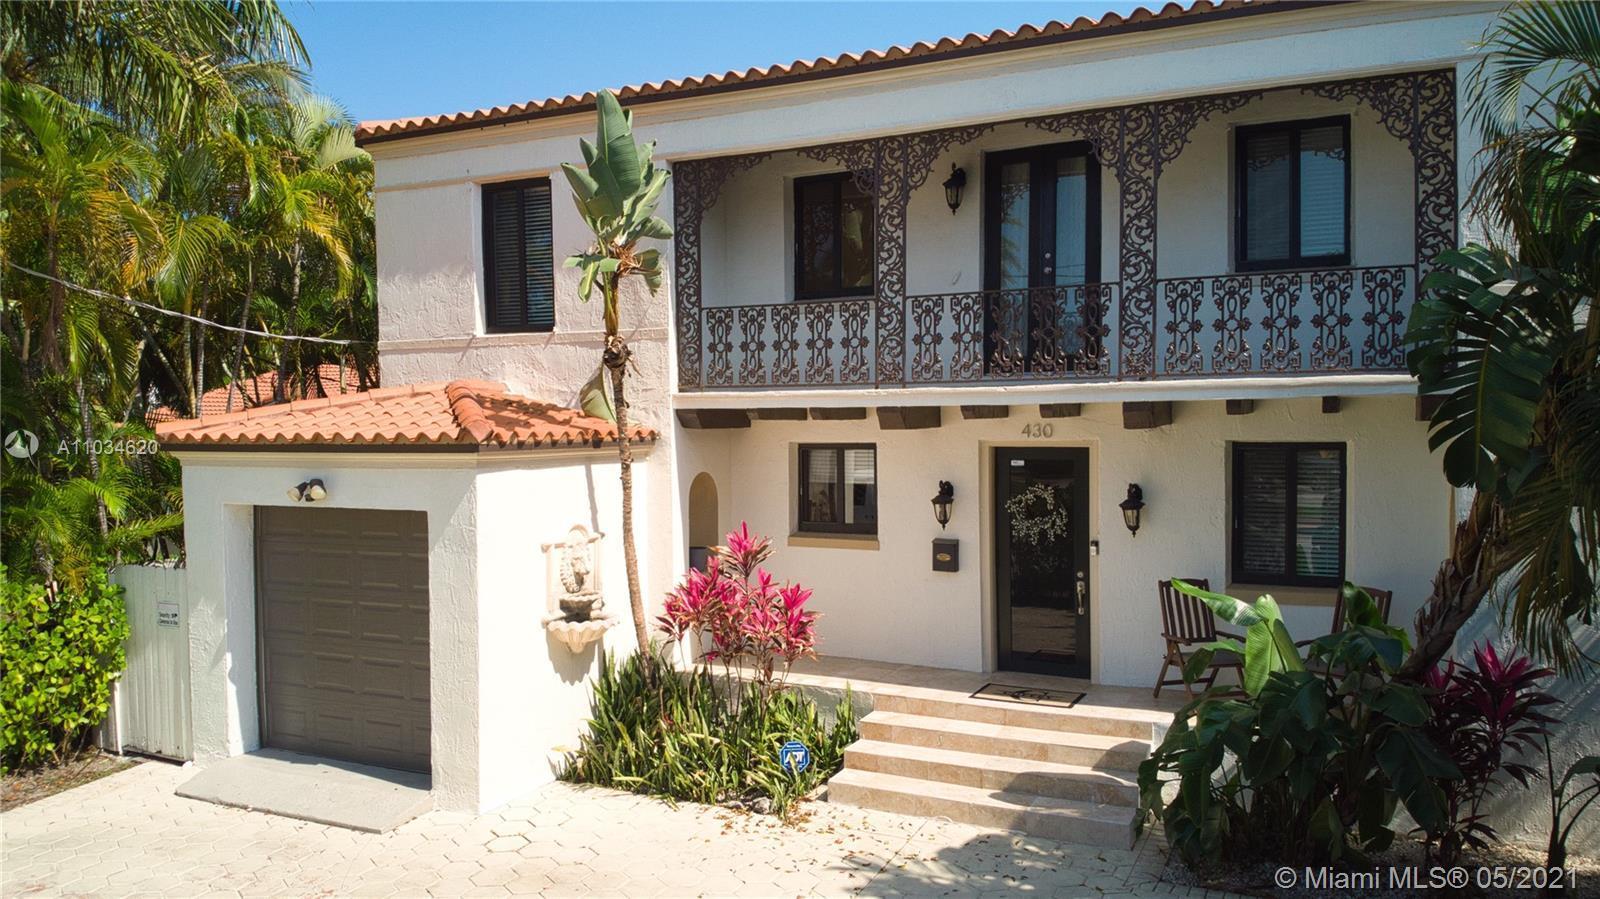 Rare, Beautiful, Mediterranean/Spanish Mini Mansion, same architect as Versace Mansion in SOBE. Move